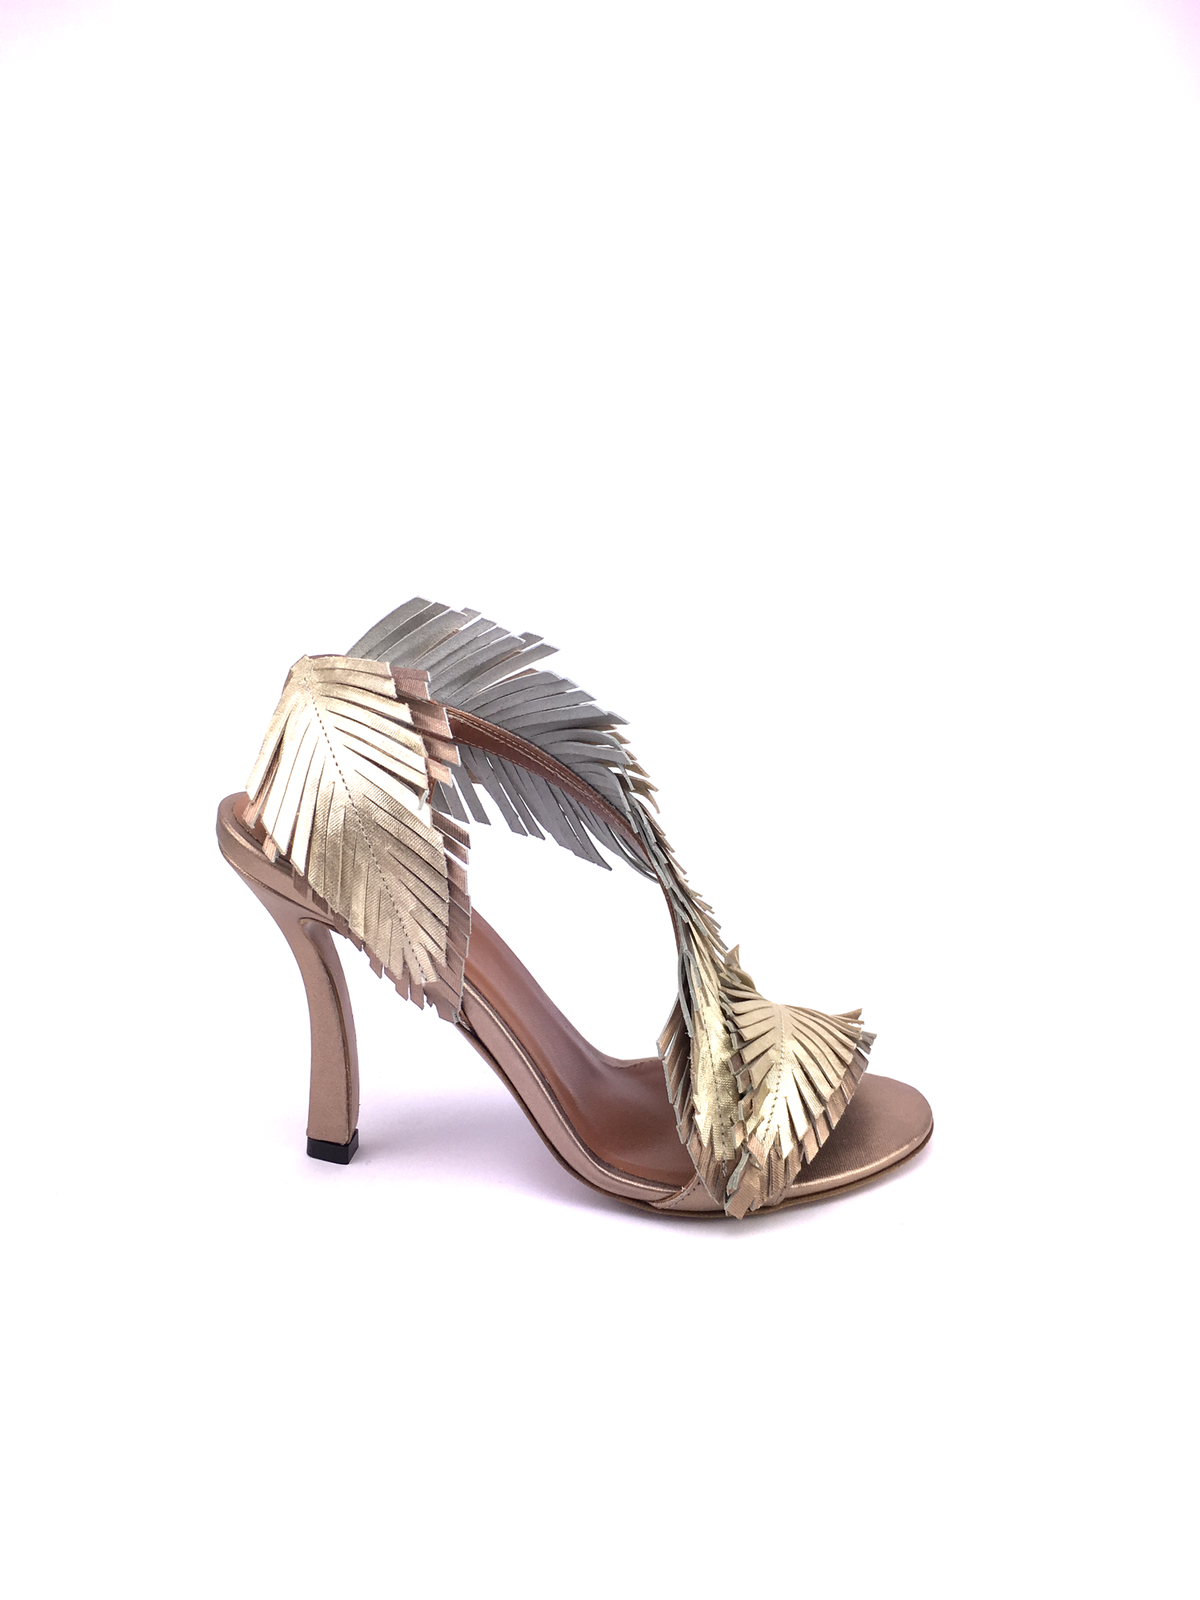 Baldowski high heel sandal with metallized leather leaves